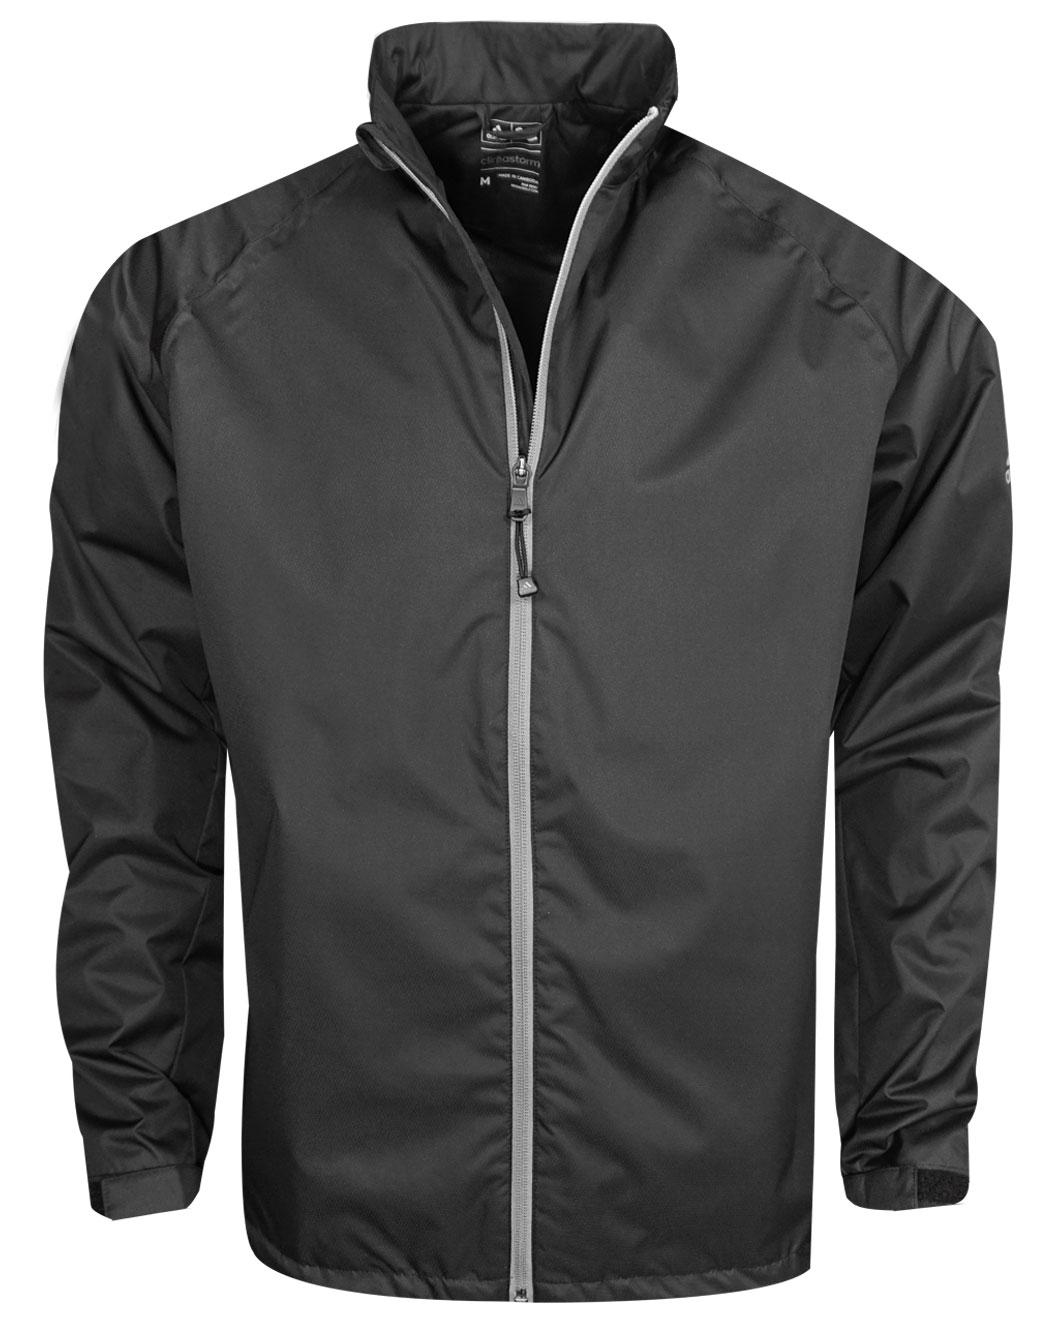 ab6b8b8f8 Adidas Climastorm Provisional II Rain Jacket | RockBottomGolf.com